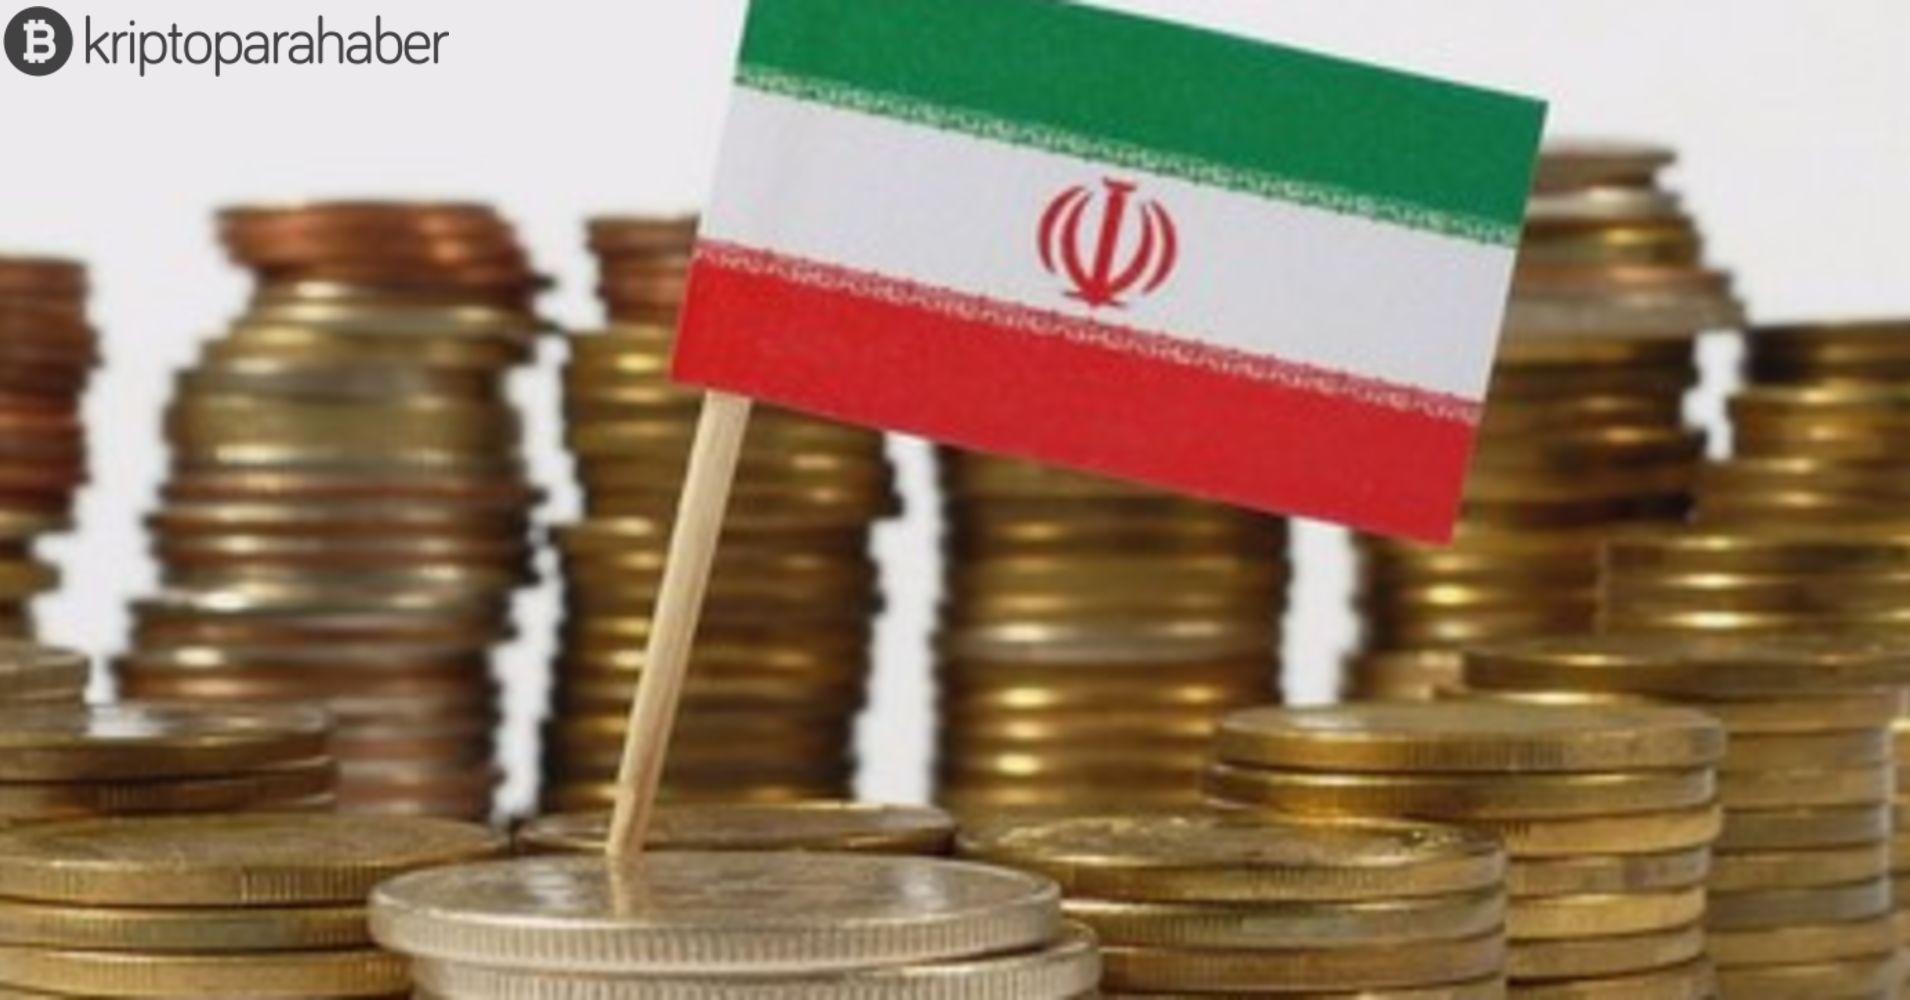 İran'da kripto para birimi madenciliği artık yasal